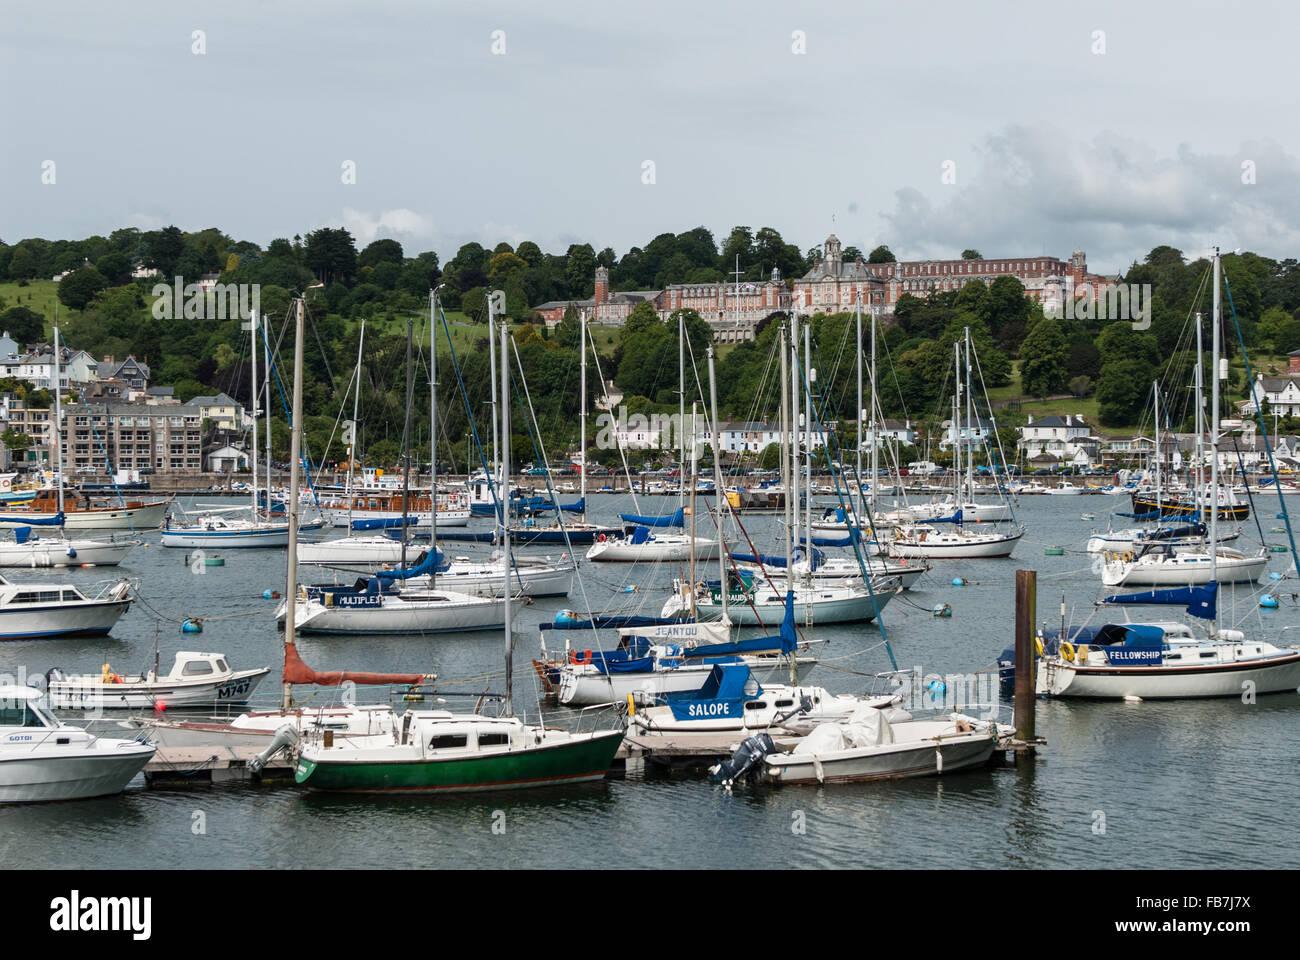 The River Dart with views towards Britannia Royal Naval College, (BRNC) Dartmouth, Devon, England. UK. Stock Photo